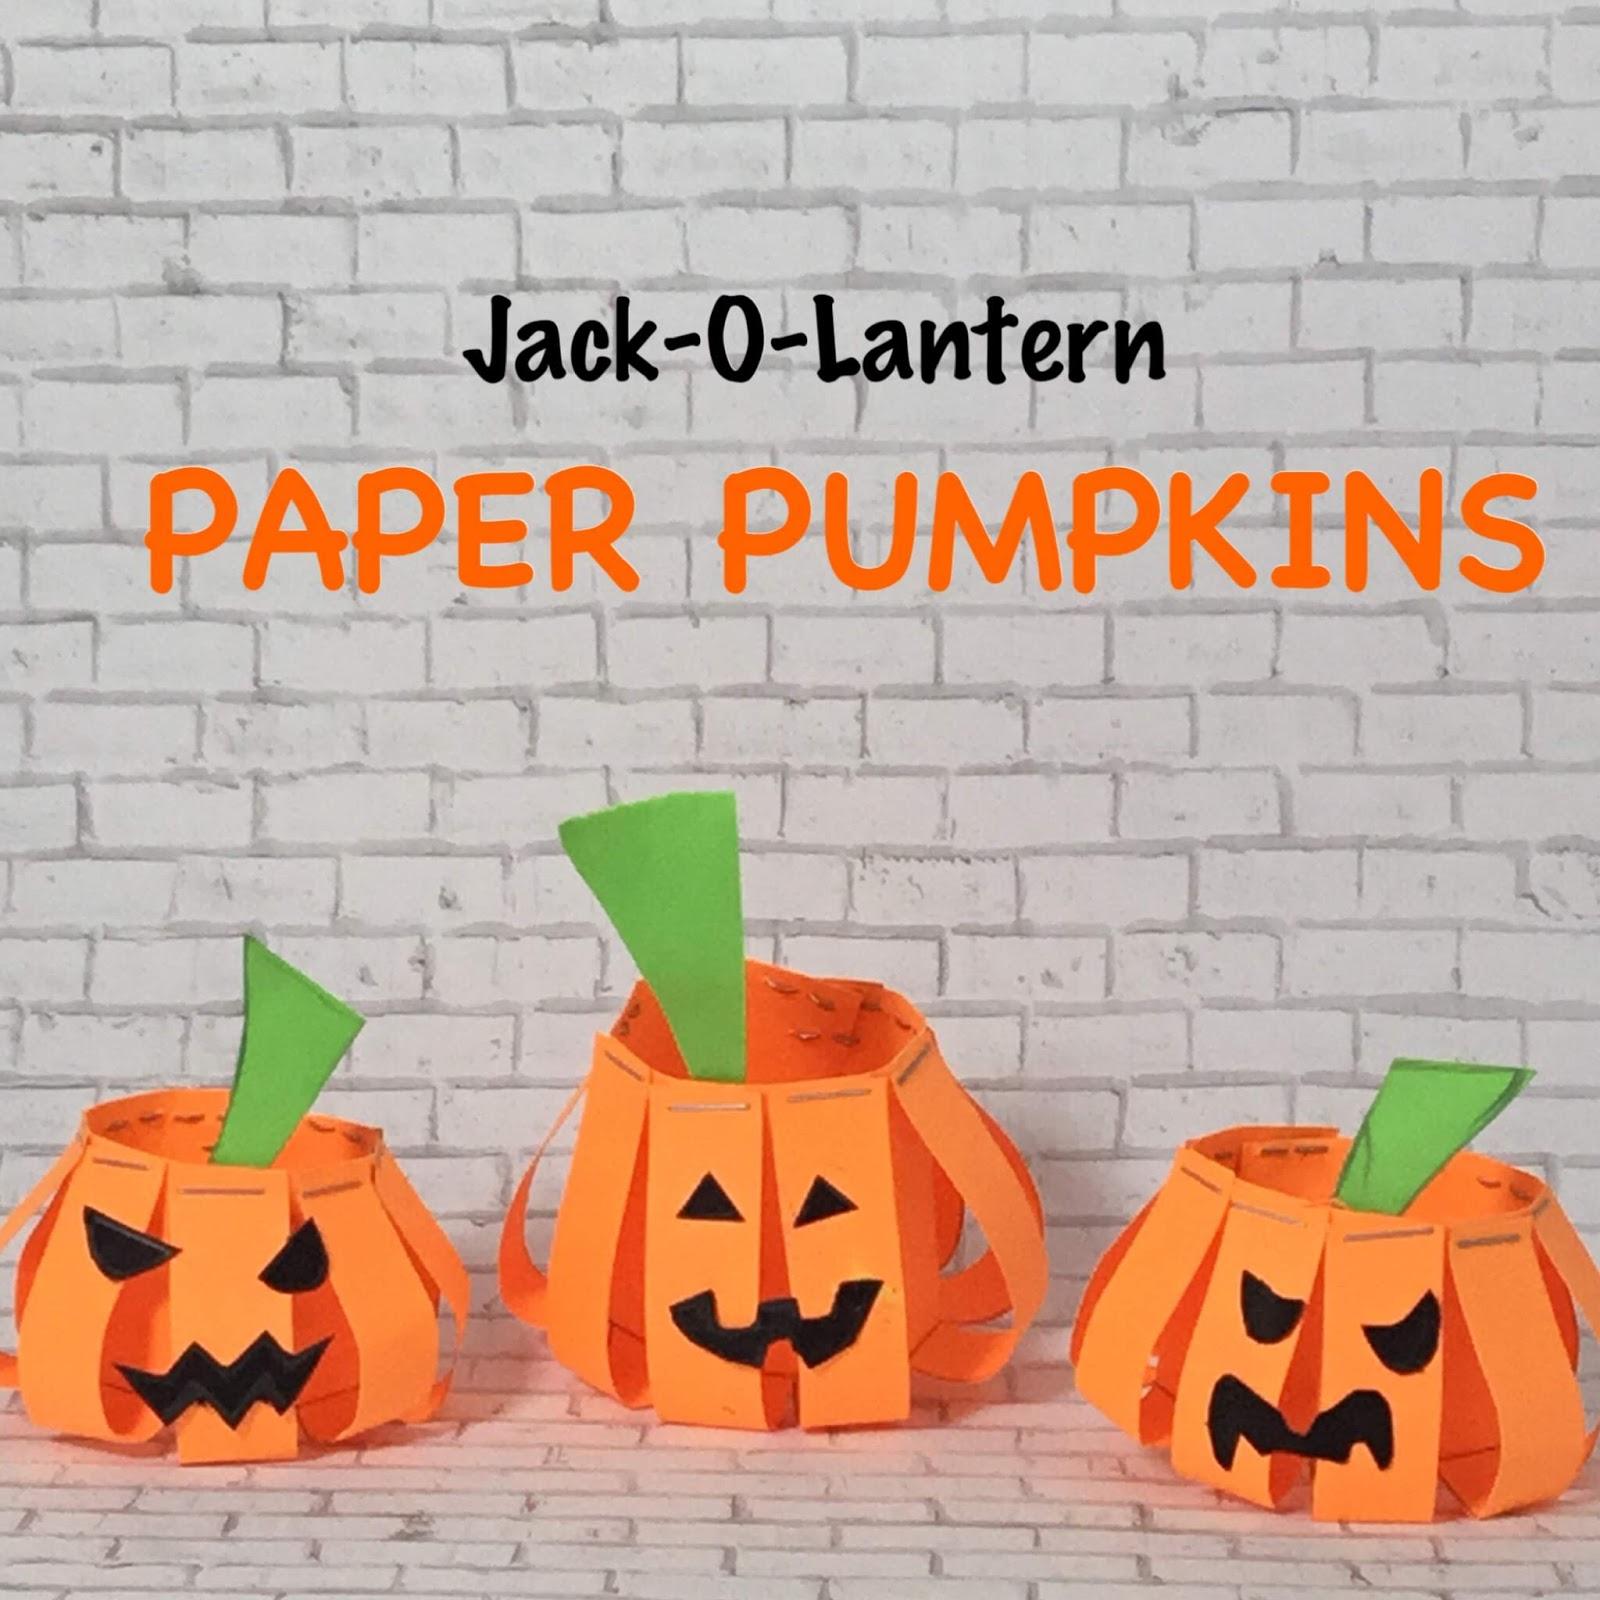 Jack-O-Lantern Paper Pumpkins